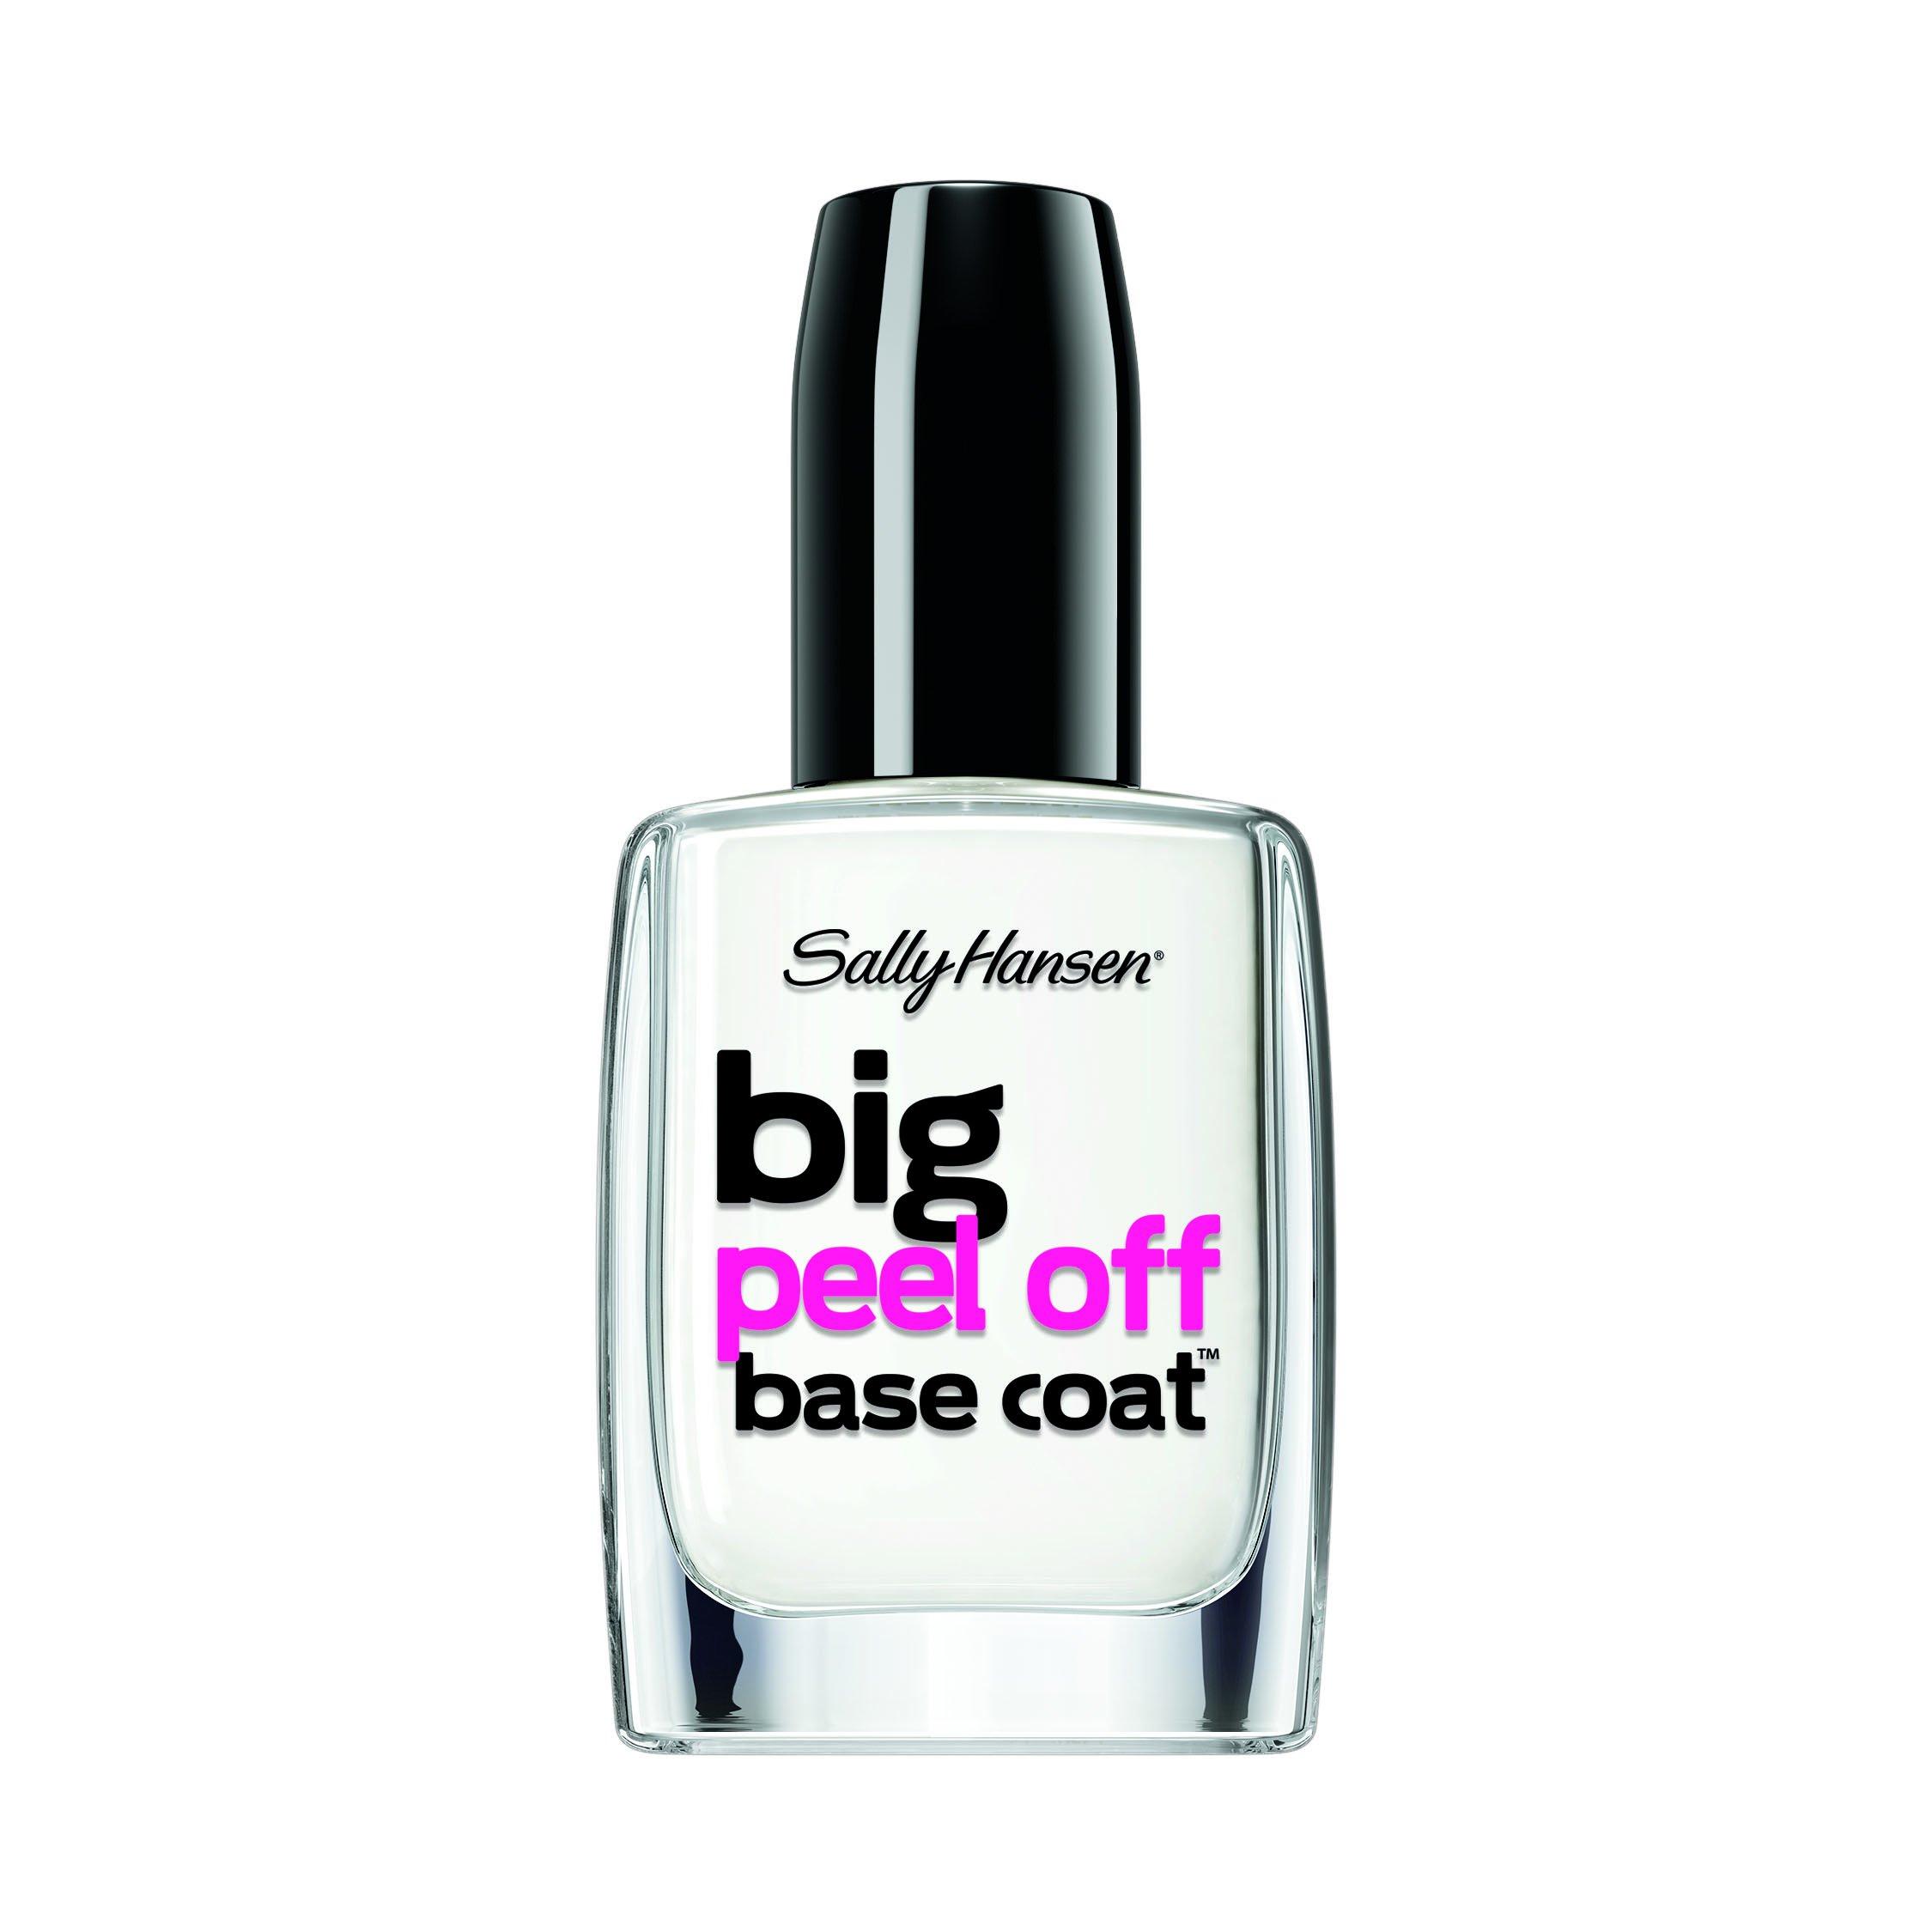 Sally hansen treatment big shiny top coat - Base coat nail salon ...